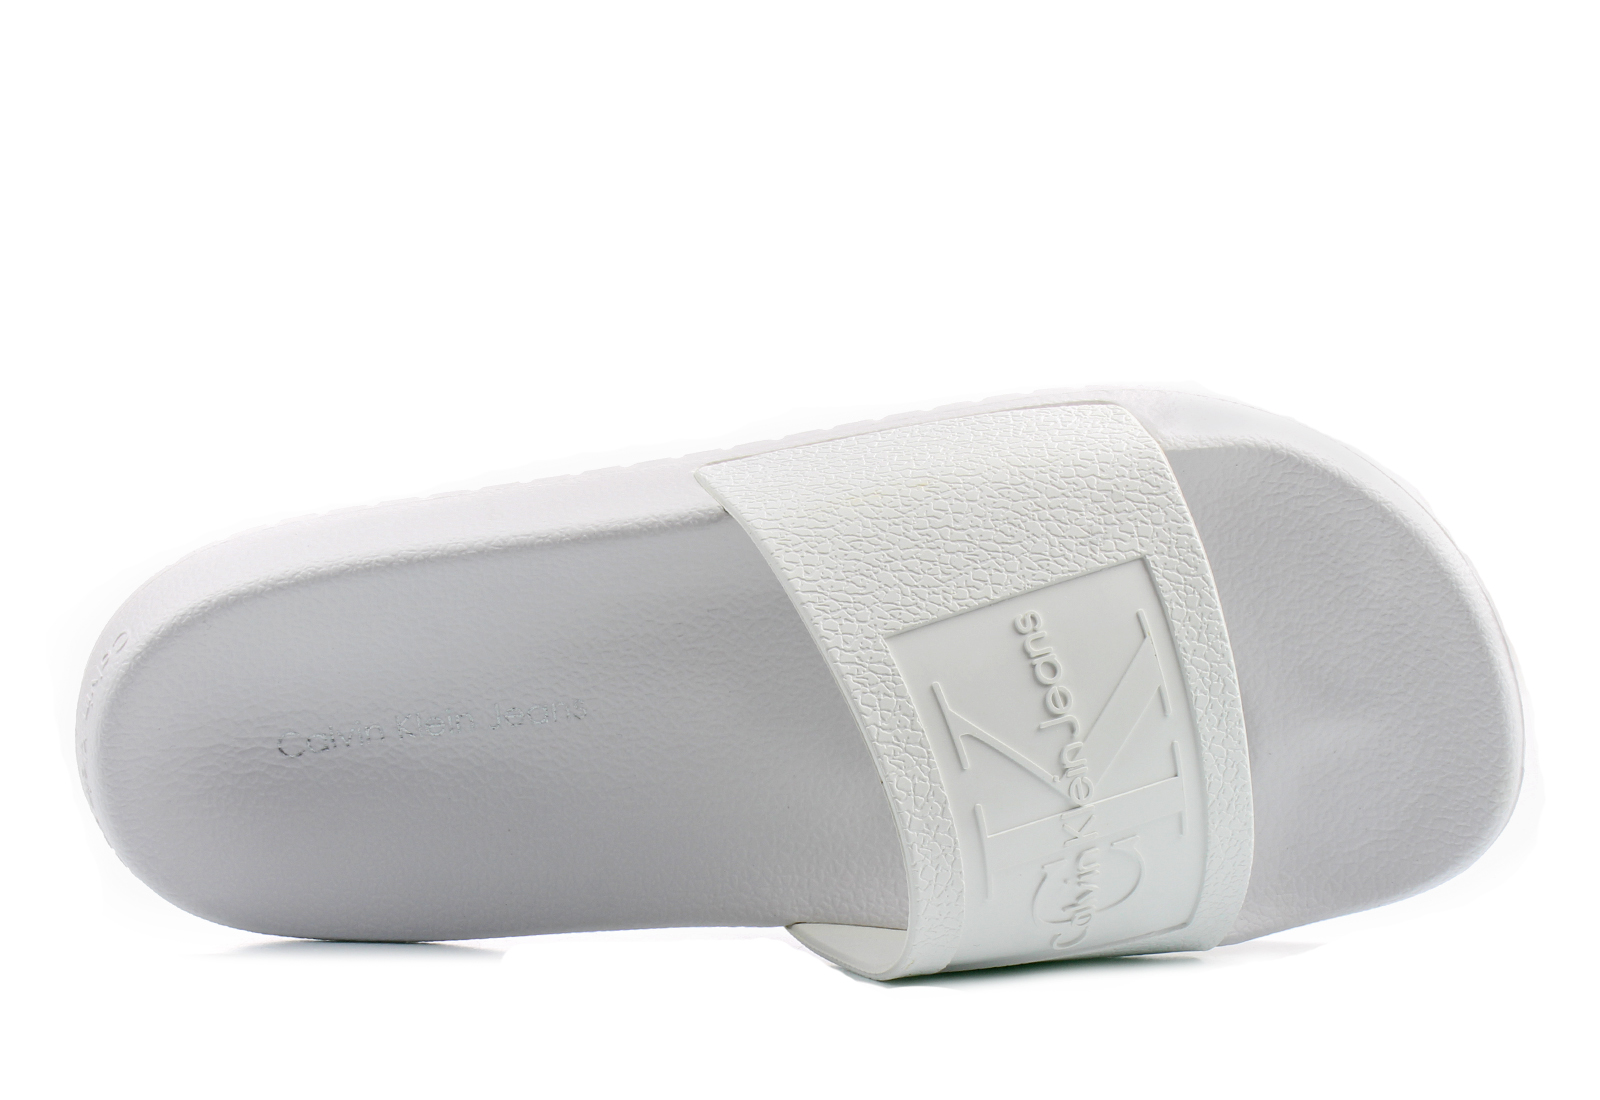 2d197a0b86 Calvin Klein Jeans Gumene Bela Papuče - Christie - Office Shoes Srbija